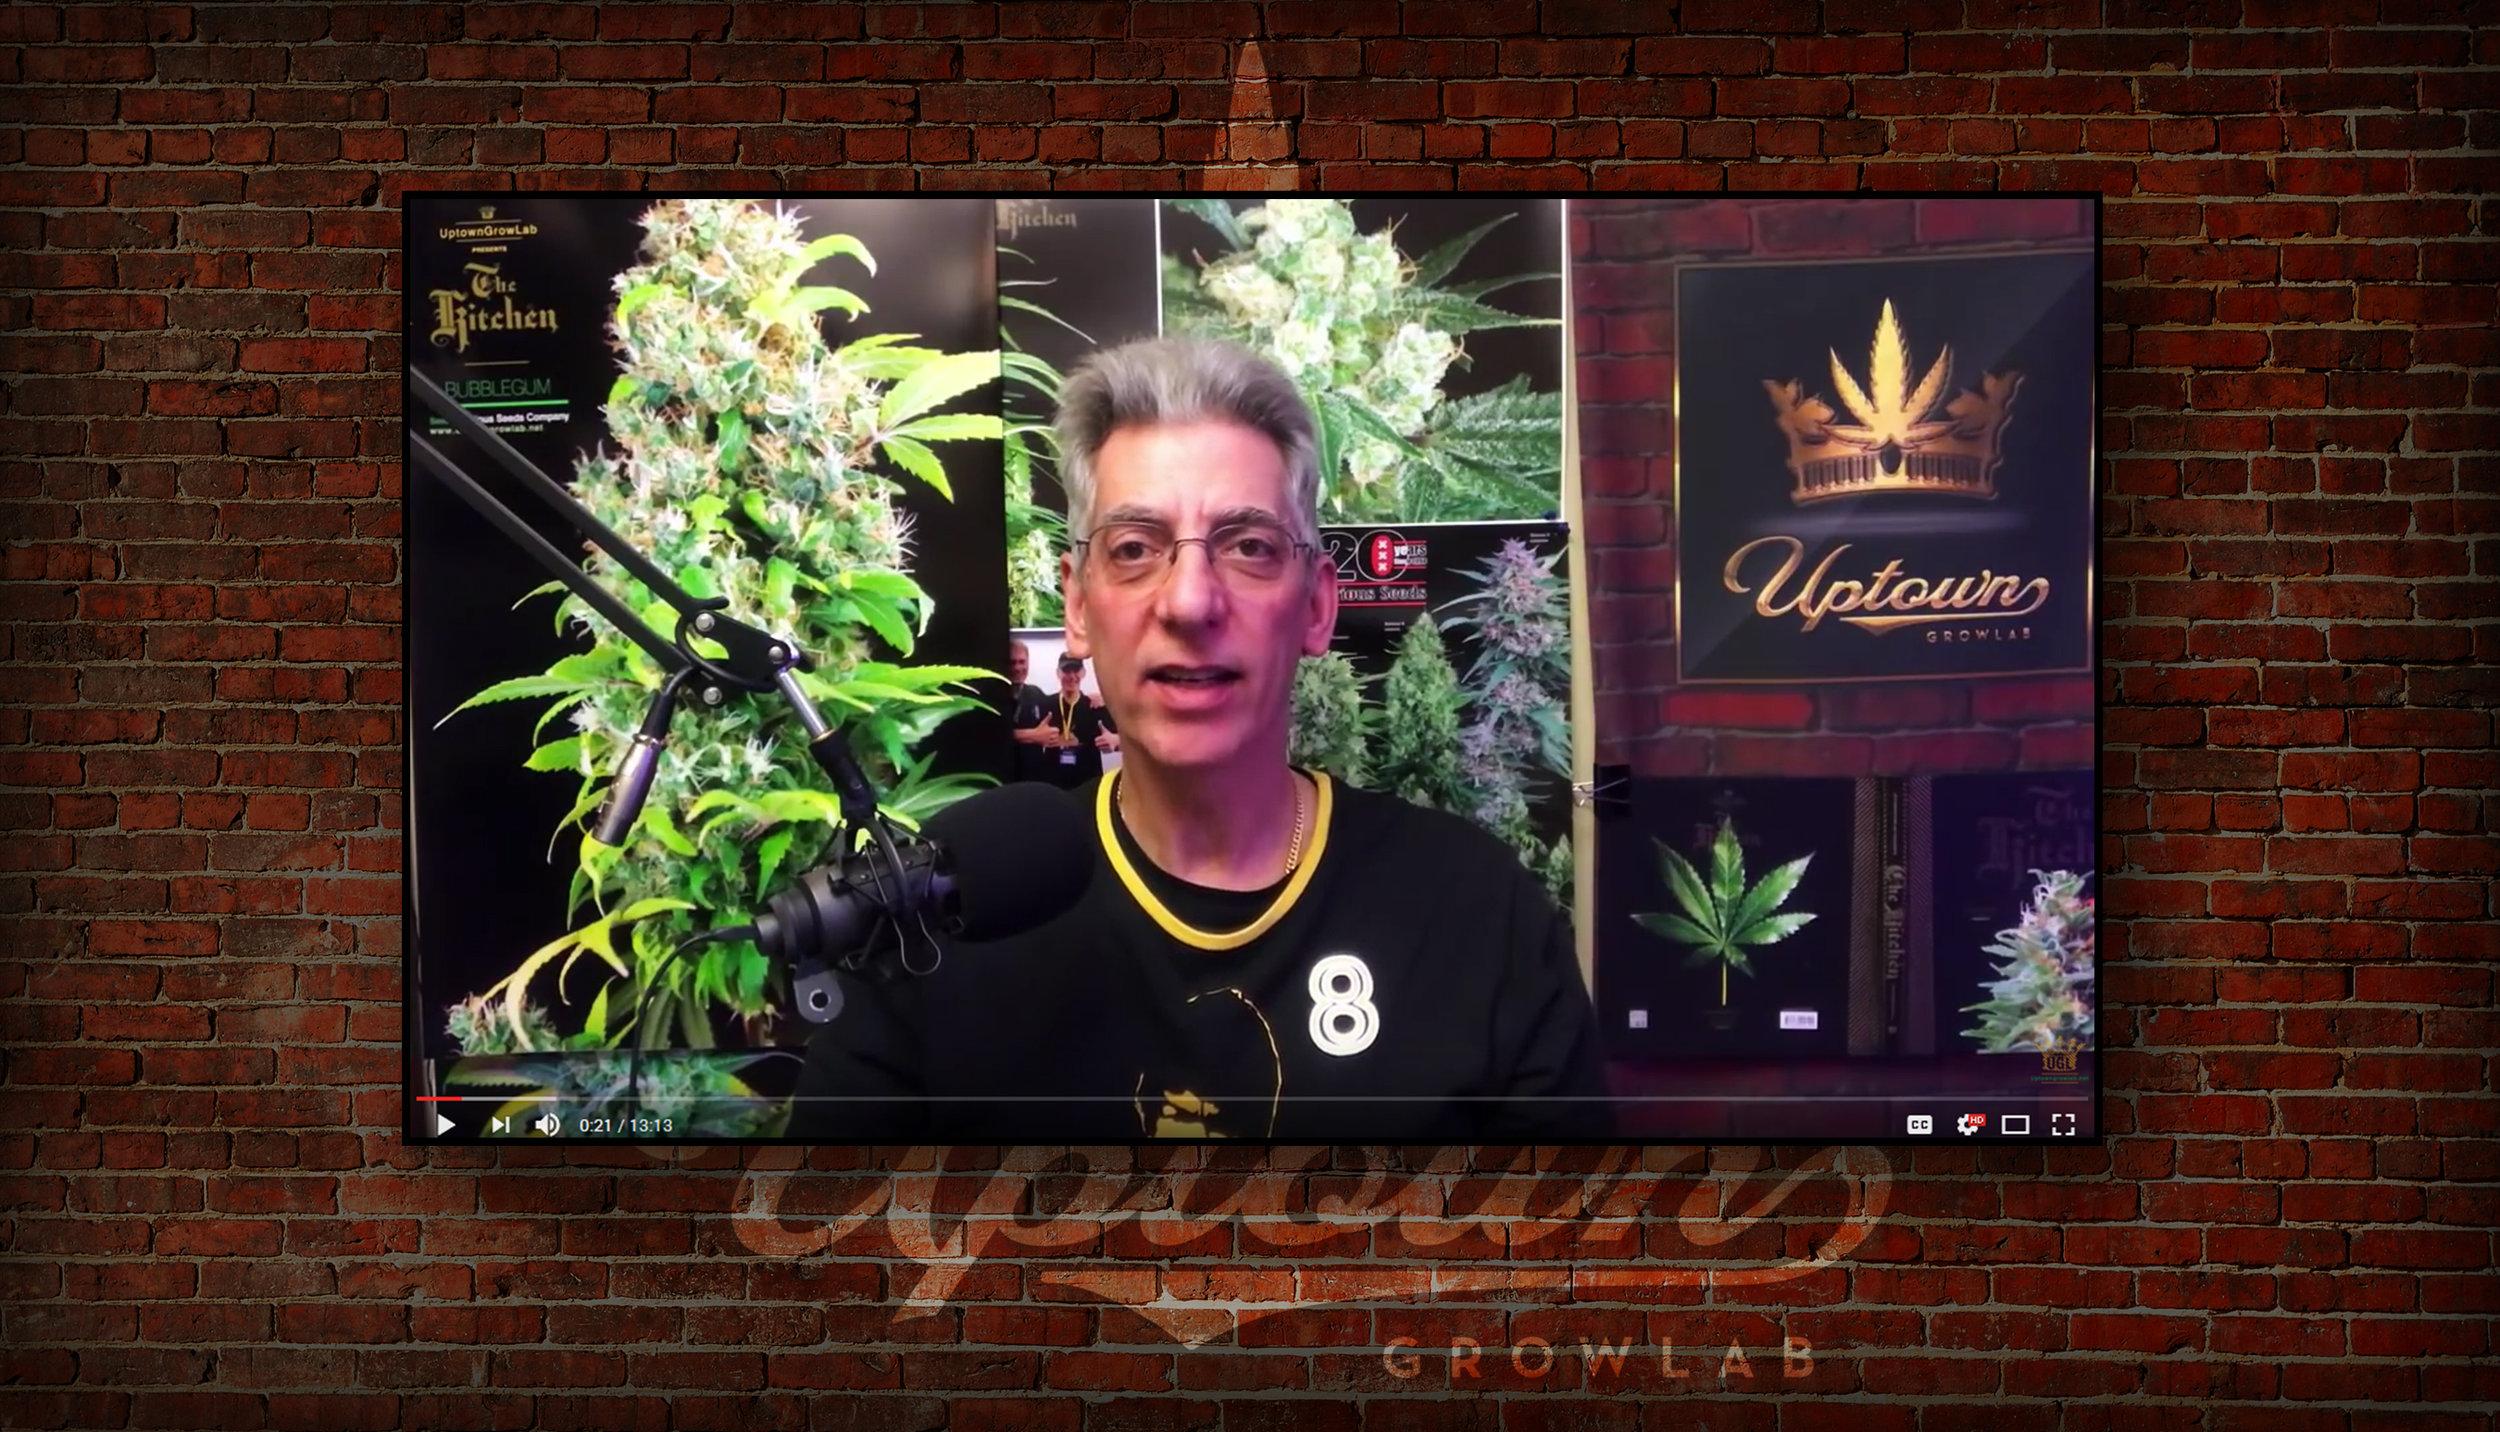 Uptown Growlab Video Series Promo Panel by Graham Hnedak Brand G Creative REV 01 JAN 2018.jpg